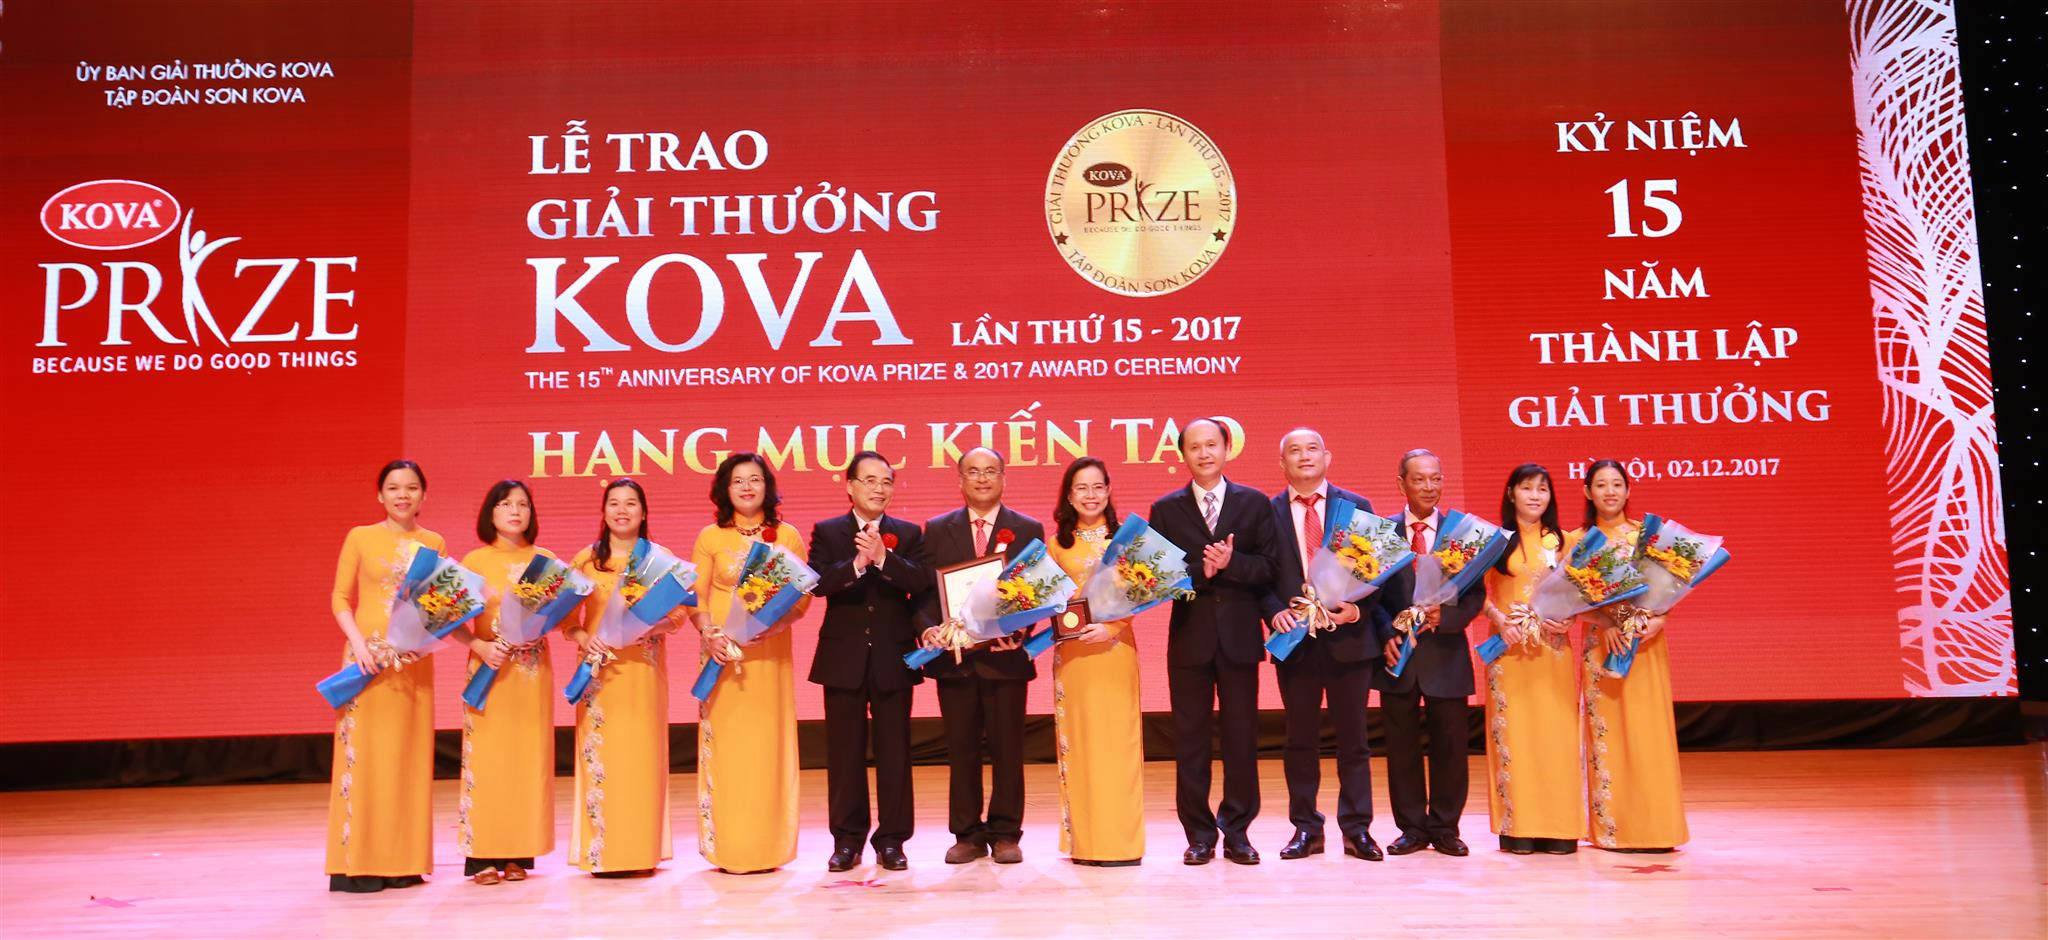 KOVA Prize